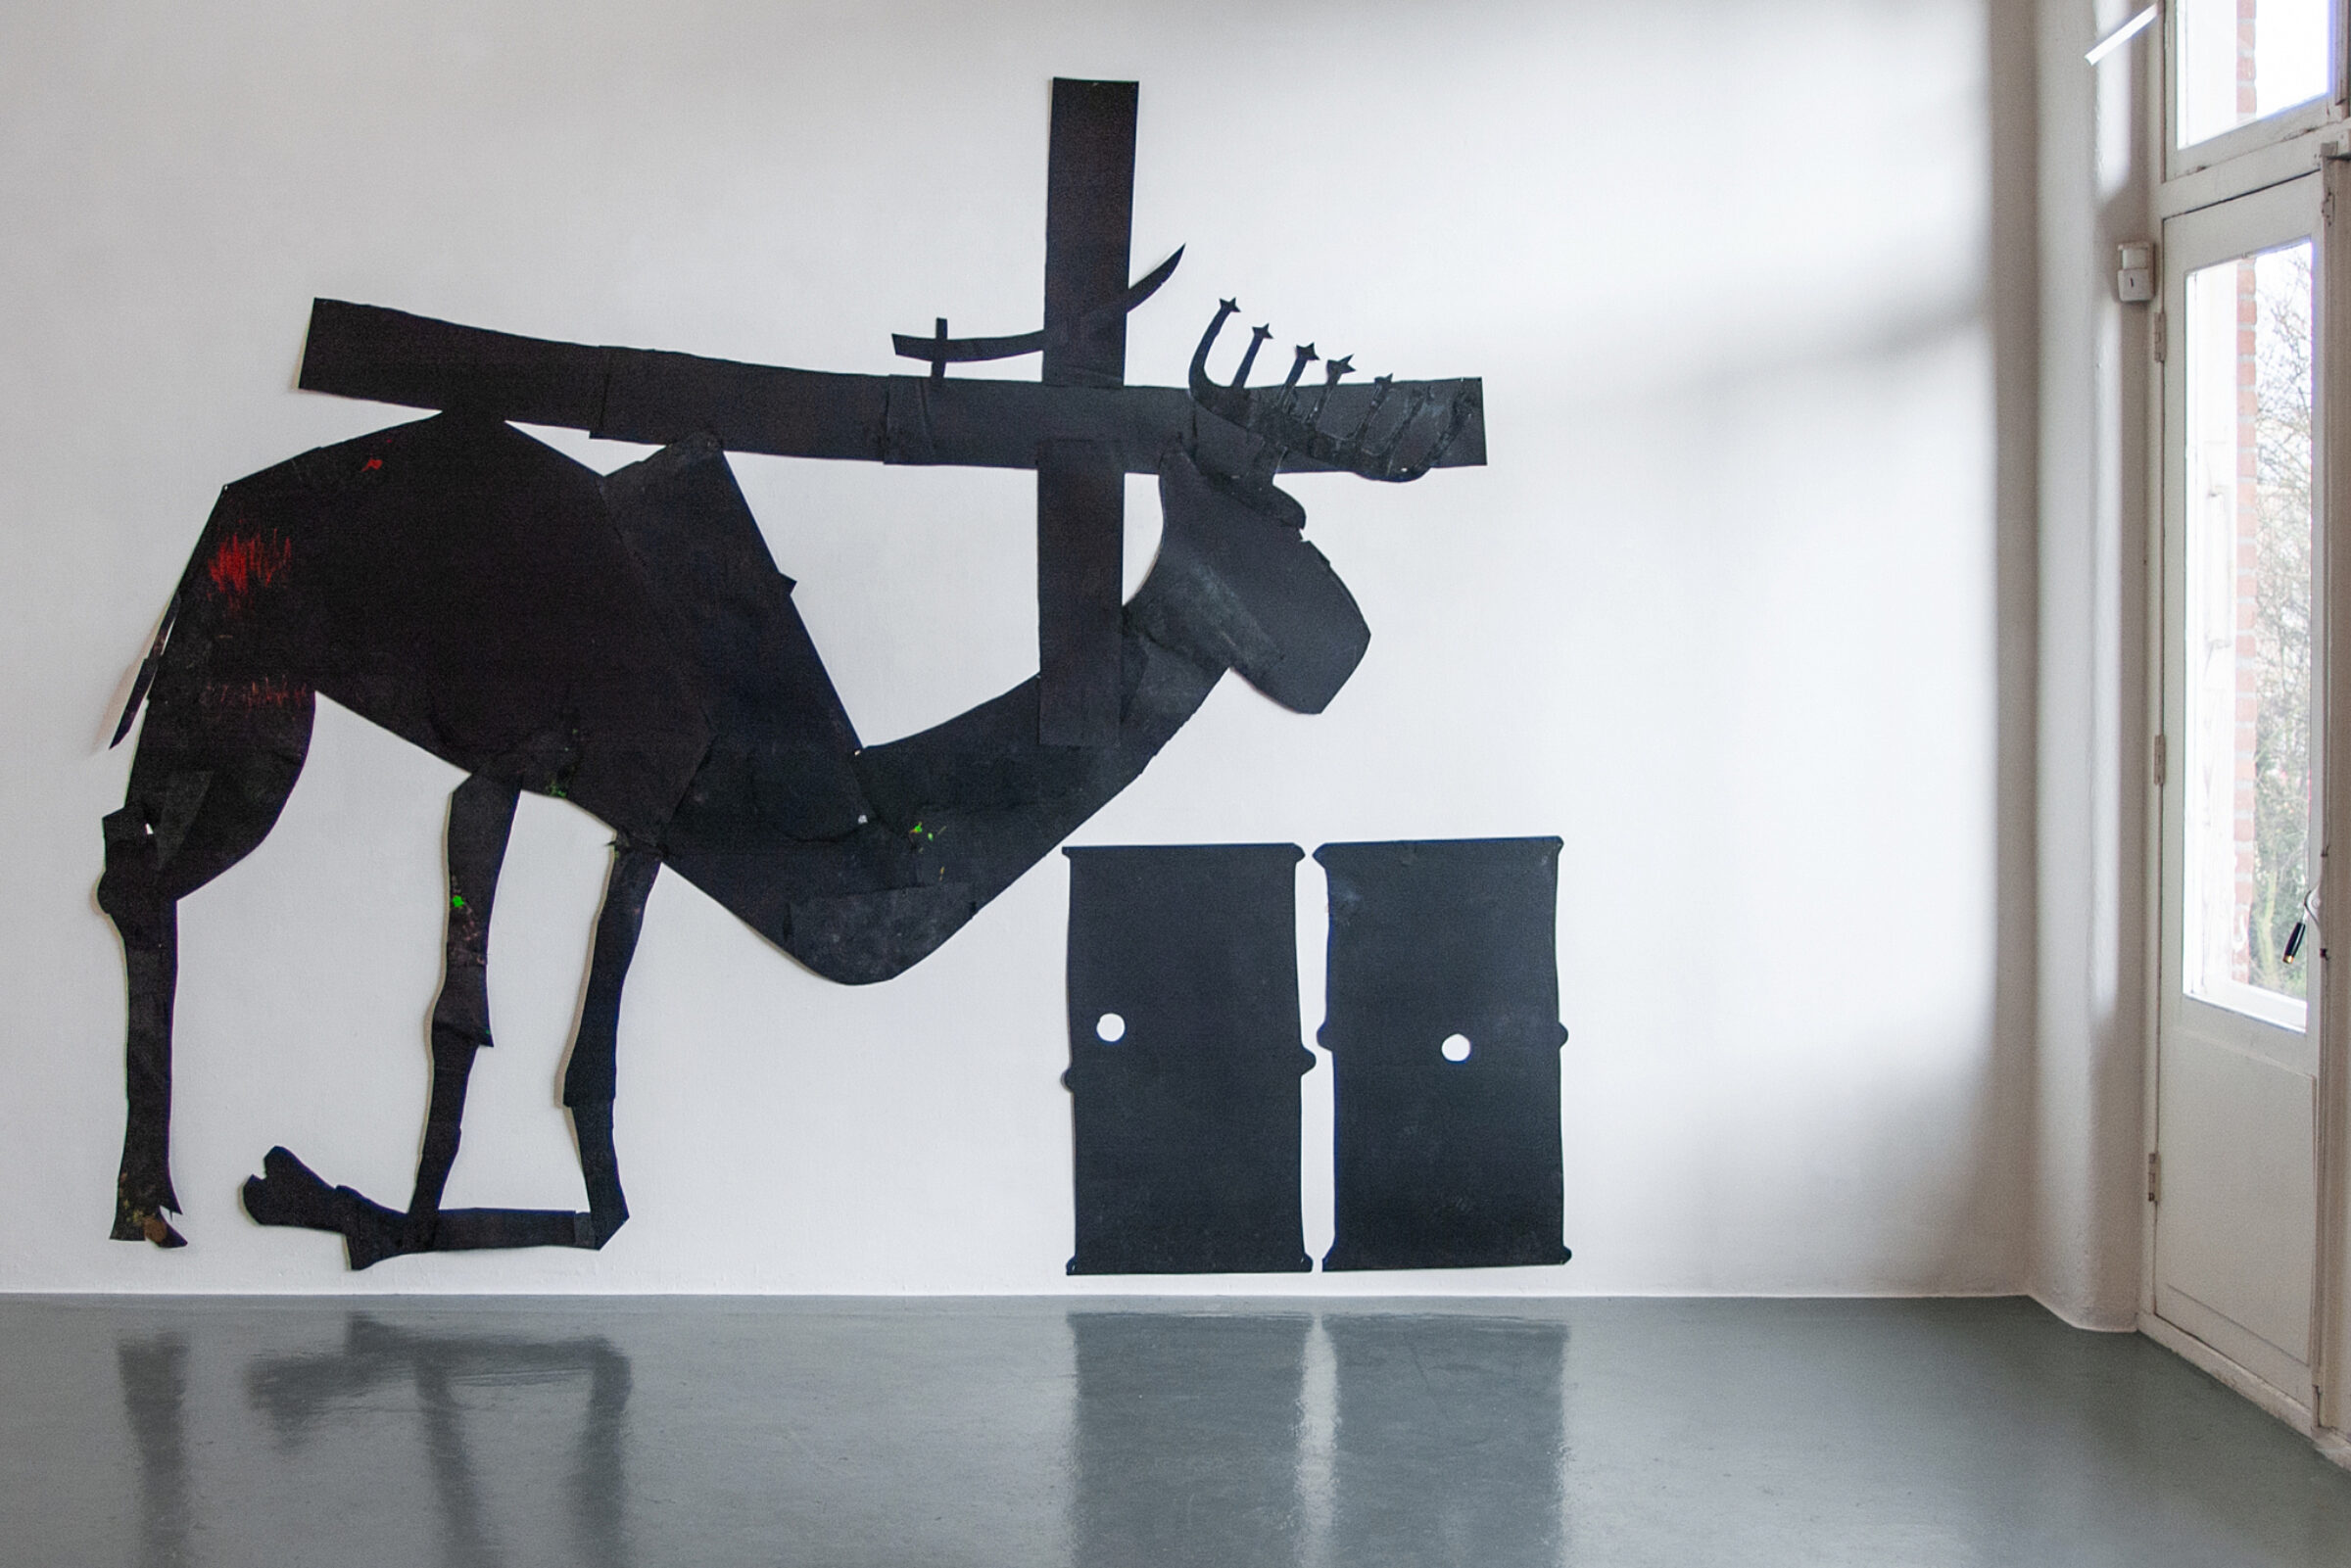 Felix-Droese_Galerie-Onrust-works_15AB.jpg